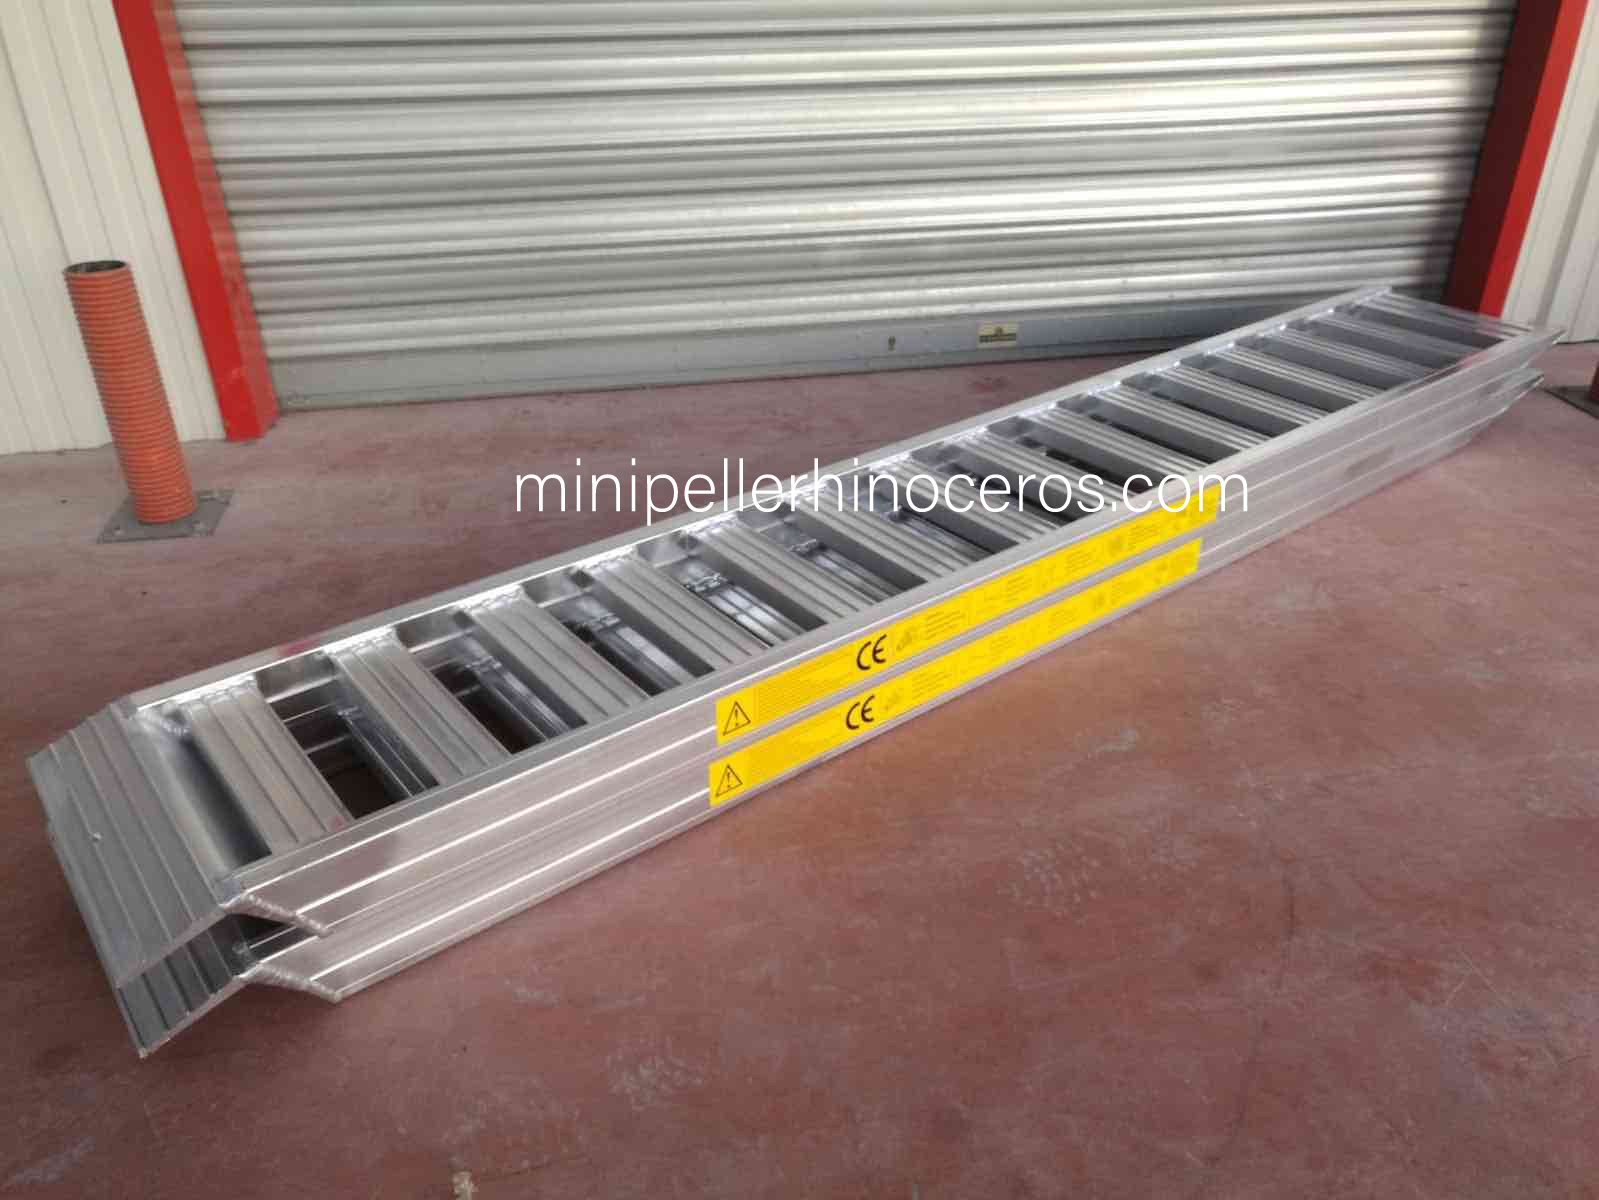 Aluminium ramps for heavy loads